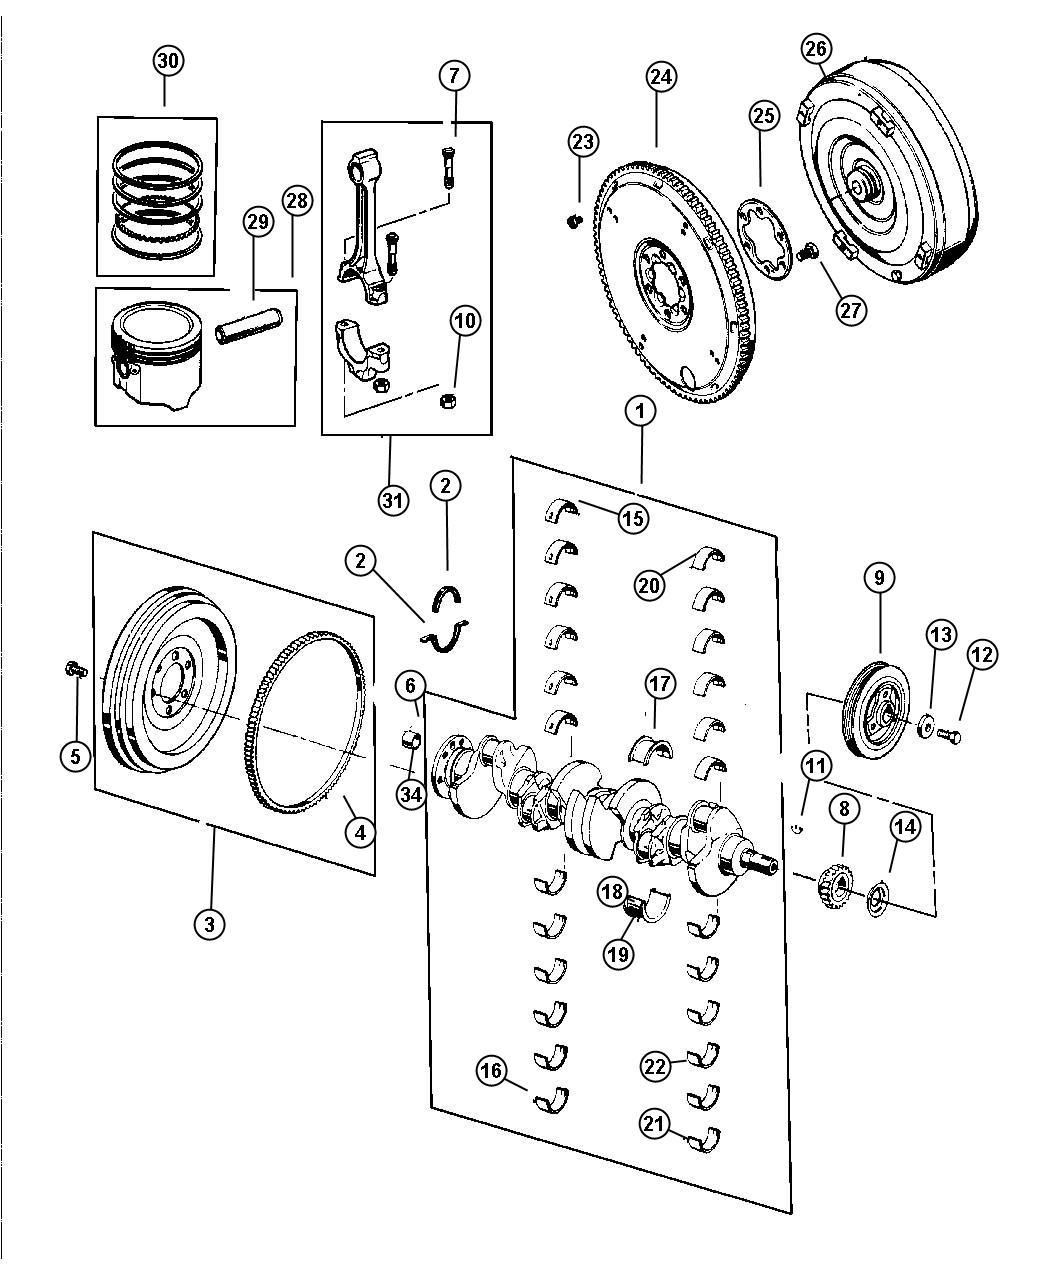 Jeep Grand Cherokee Crankshaft, Piston and Torque